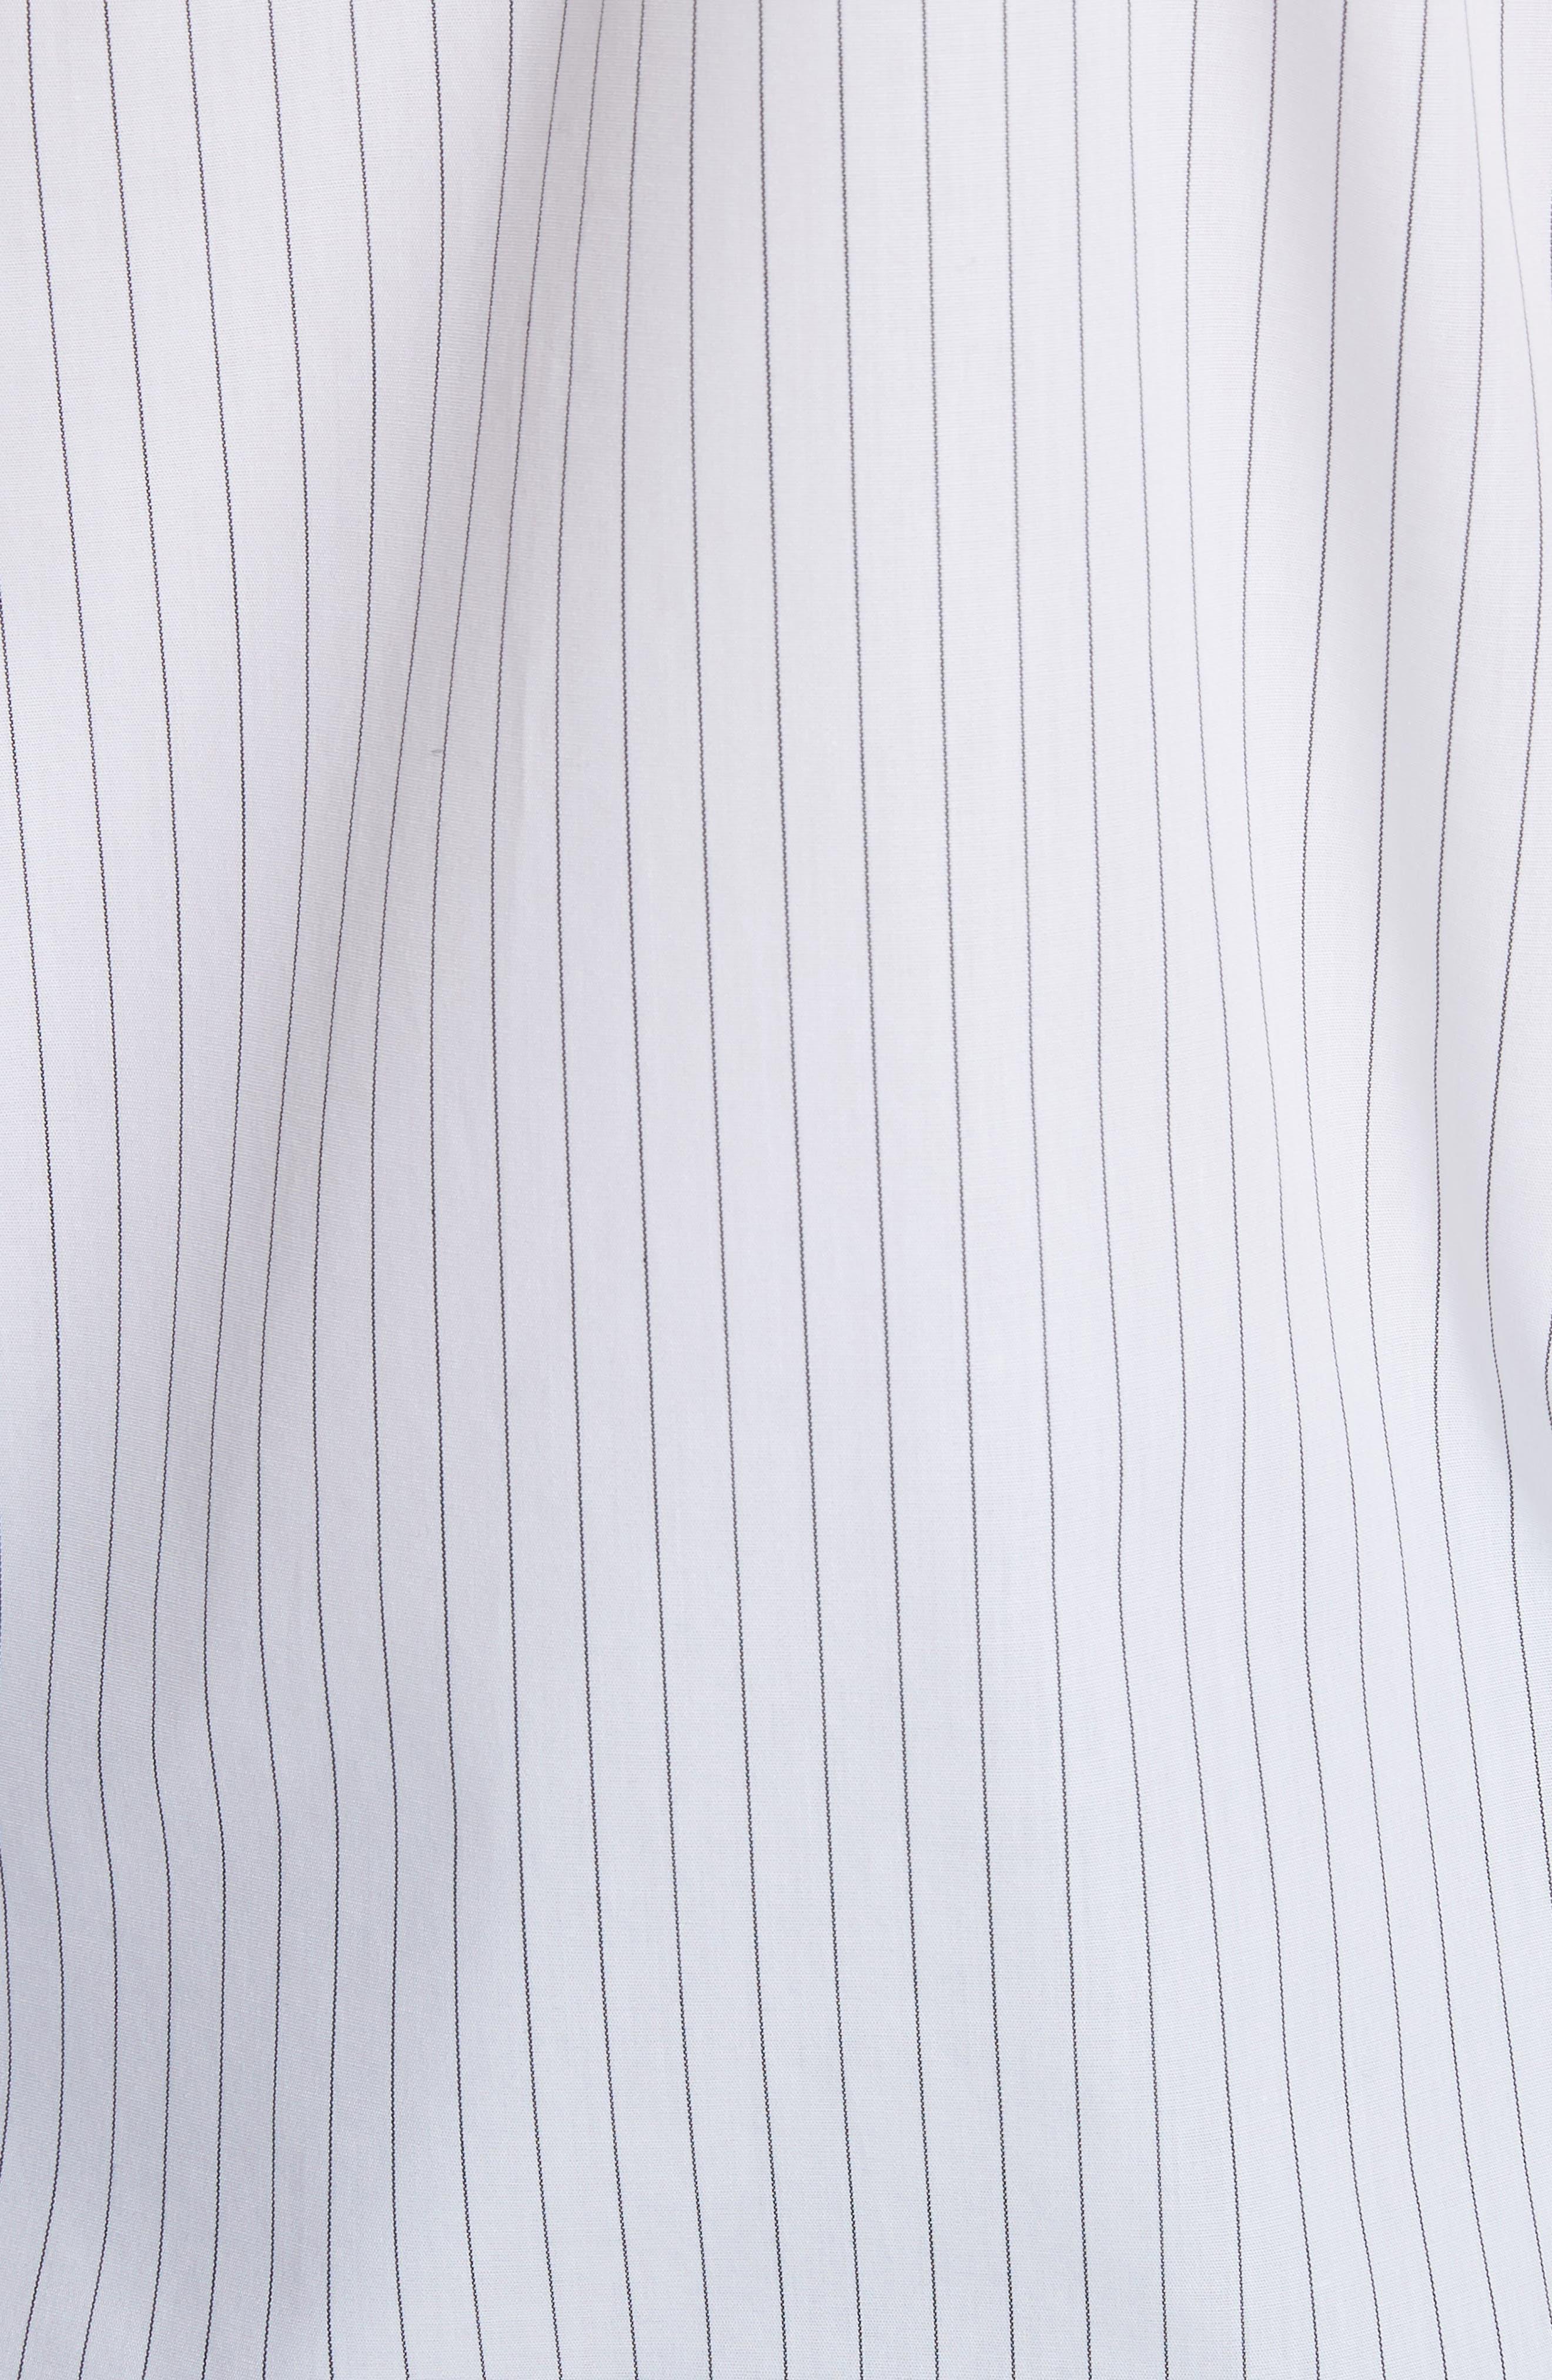 Sleeveless Poplin Top,                             Alternate thumbnail 5, color,                             White/ Black Stripe